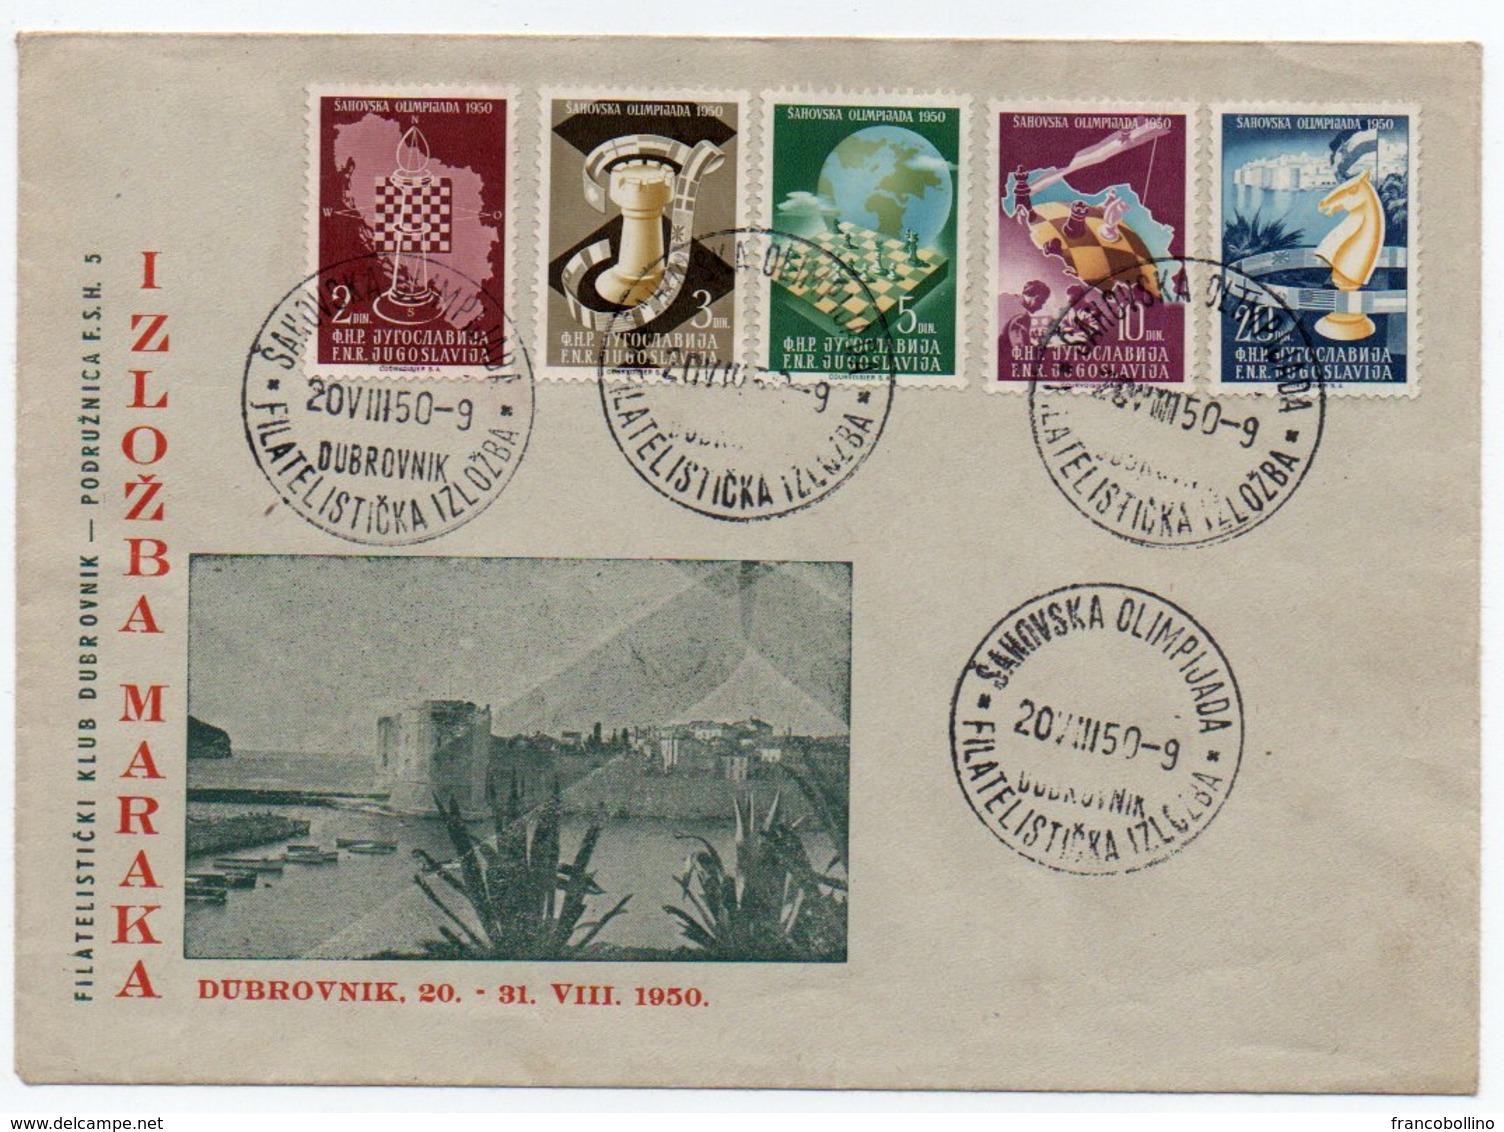 YUGOSLAVIA - FDC CHESS OLYMPICS DUBROVNIK 1950 - Storia Postale